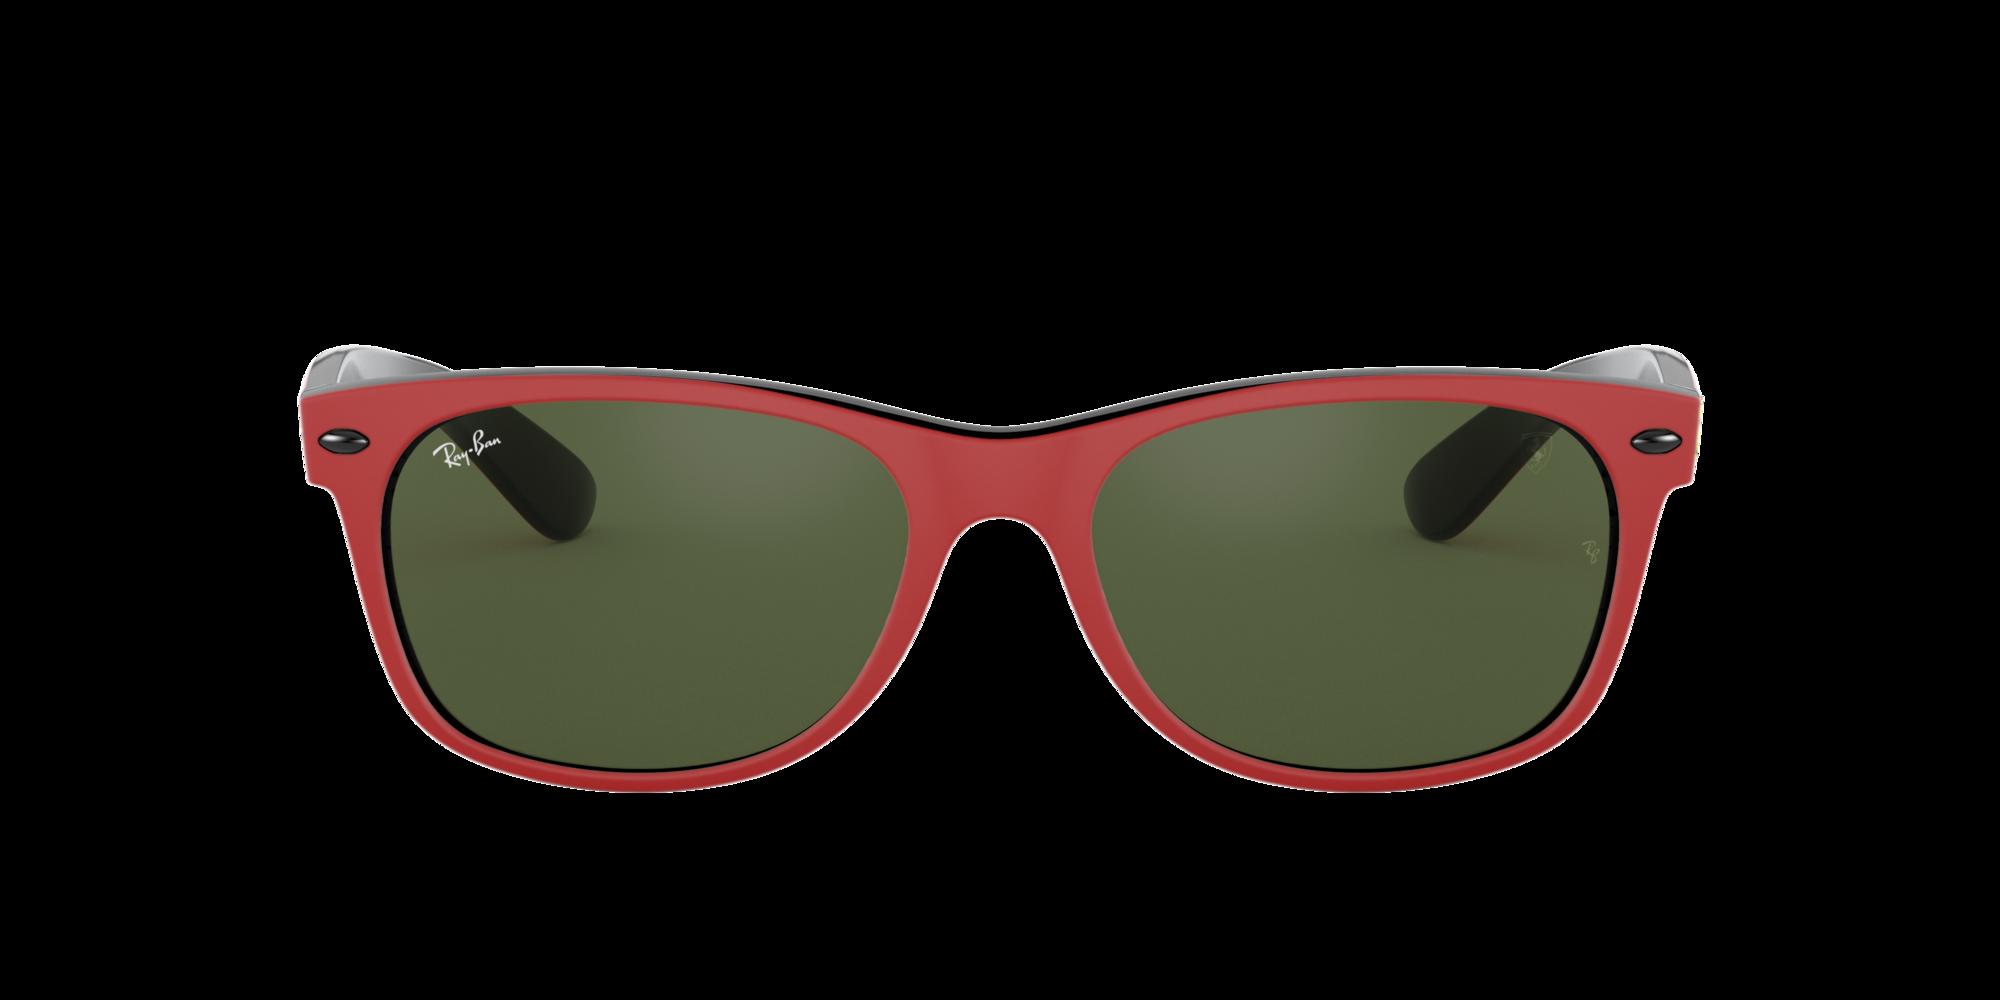 Image for RB2132M 55 NEW WAYFARER from LensCrafters | Glasses, Prescription Glasses Online, Eyewear